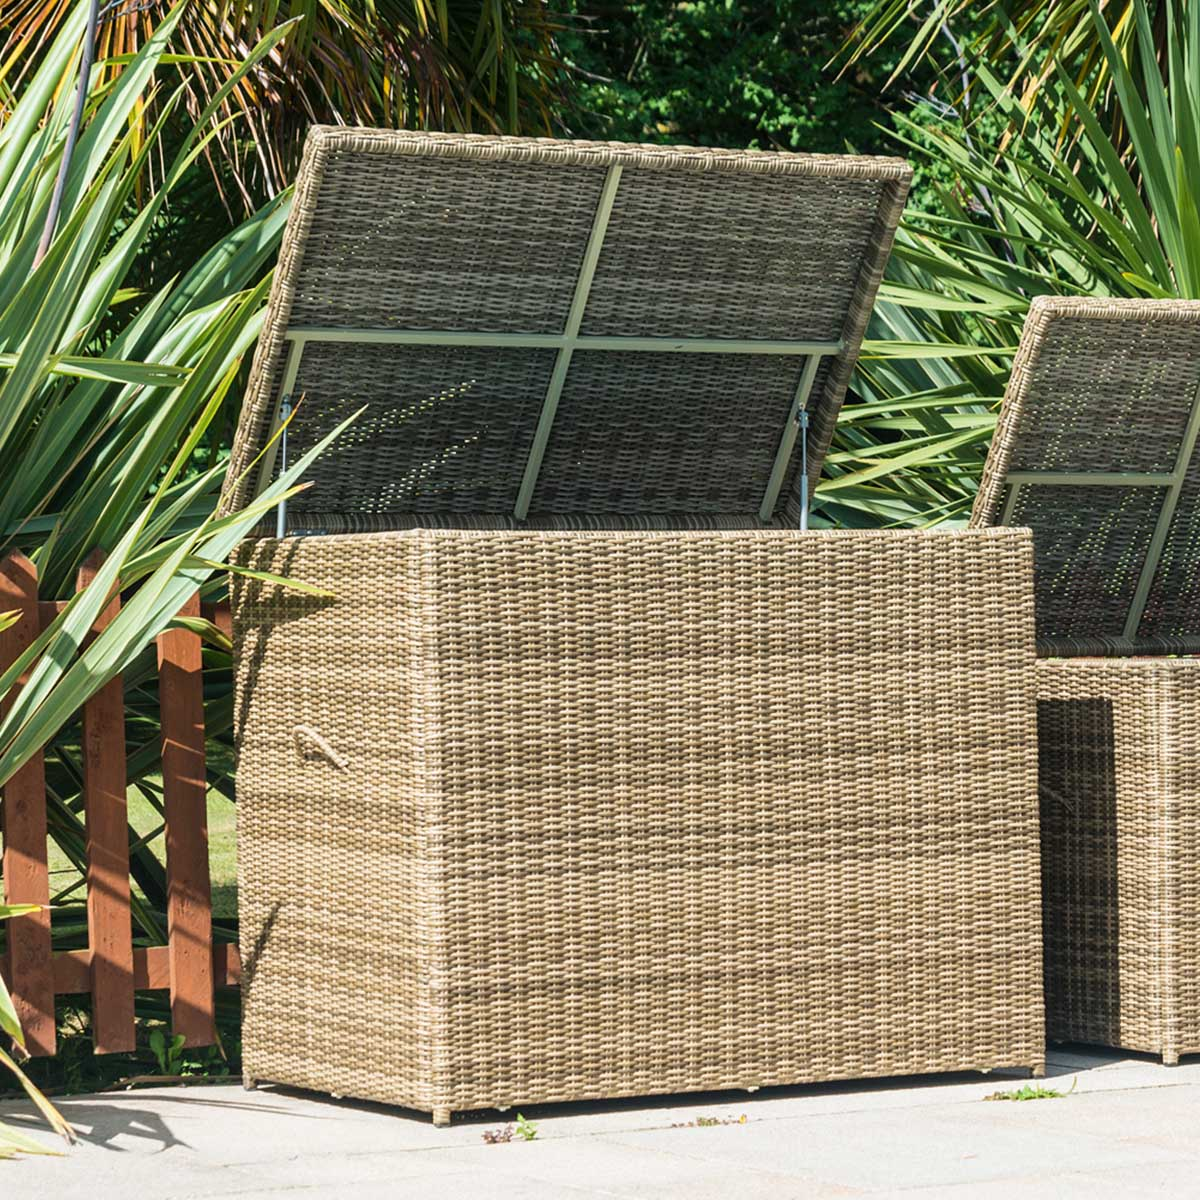 Glencrest Katie Blake Seville Large Waterproof Cushion Storage Box - Natural